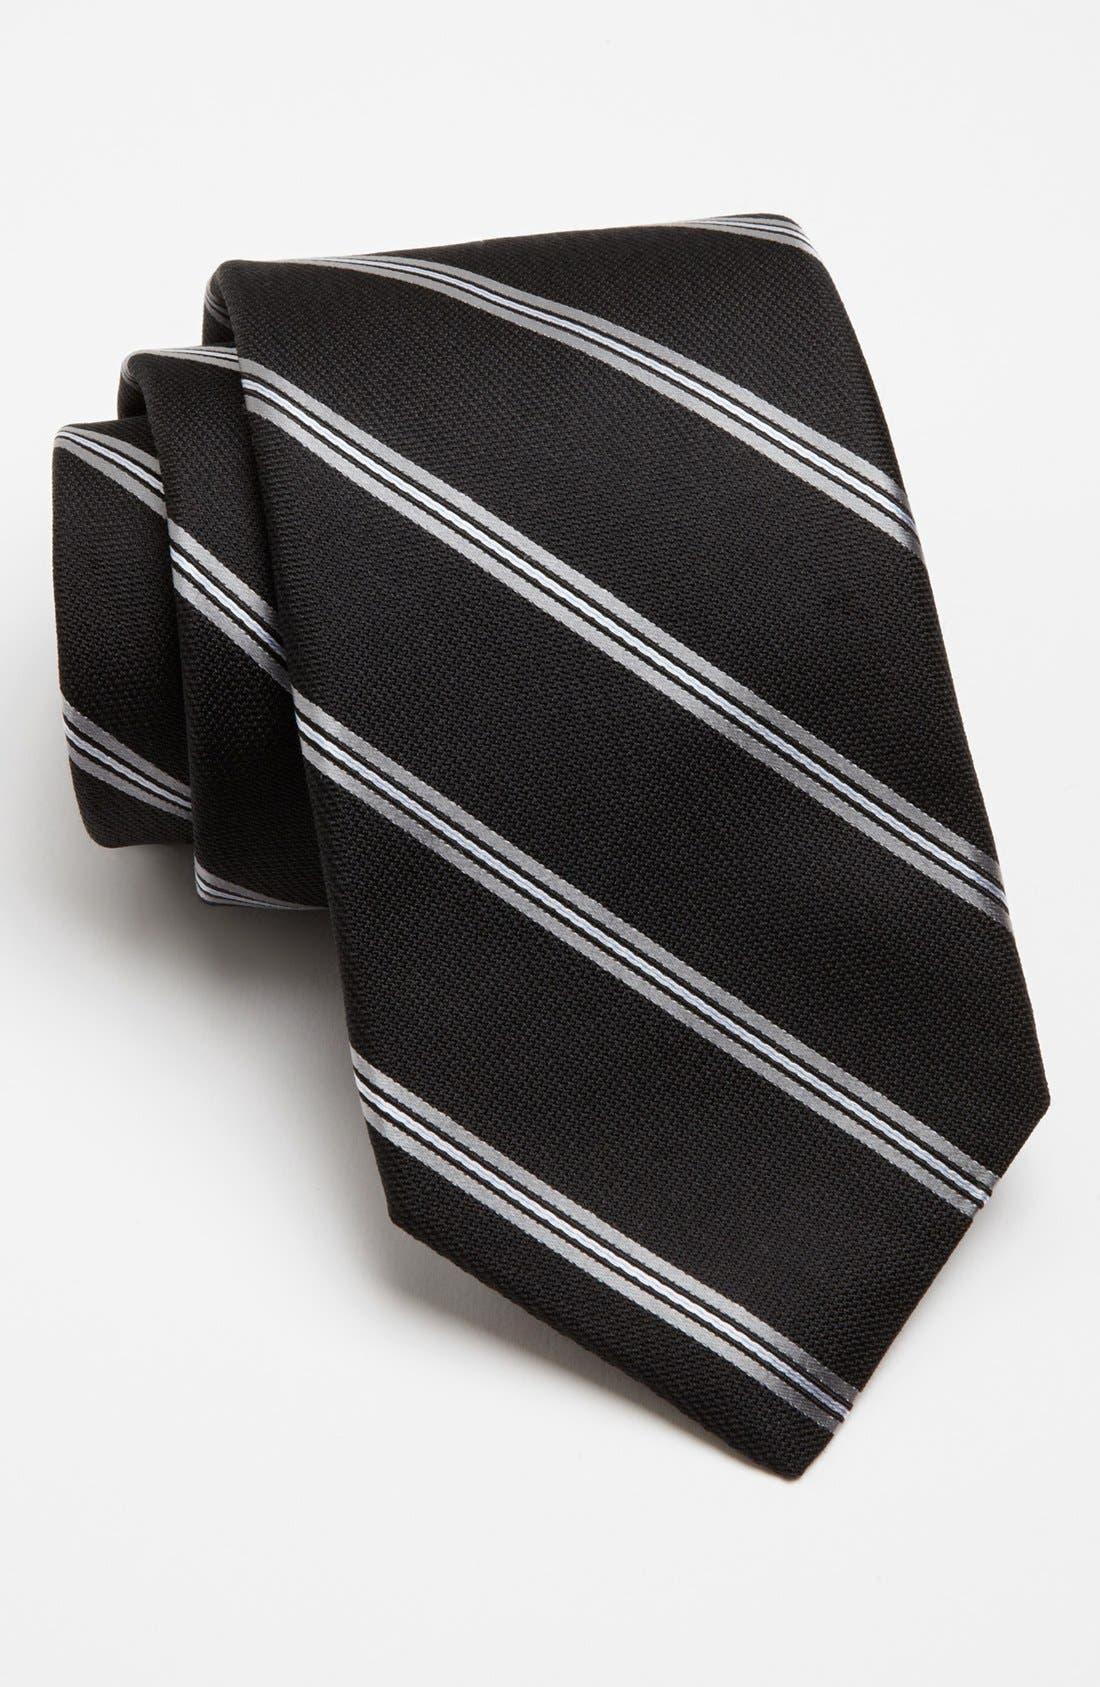 Alternate Image 1 Selected - Michael Kors Woven Silk Tie